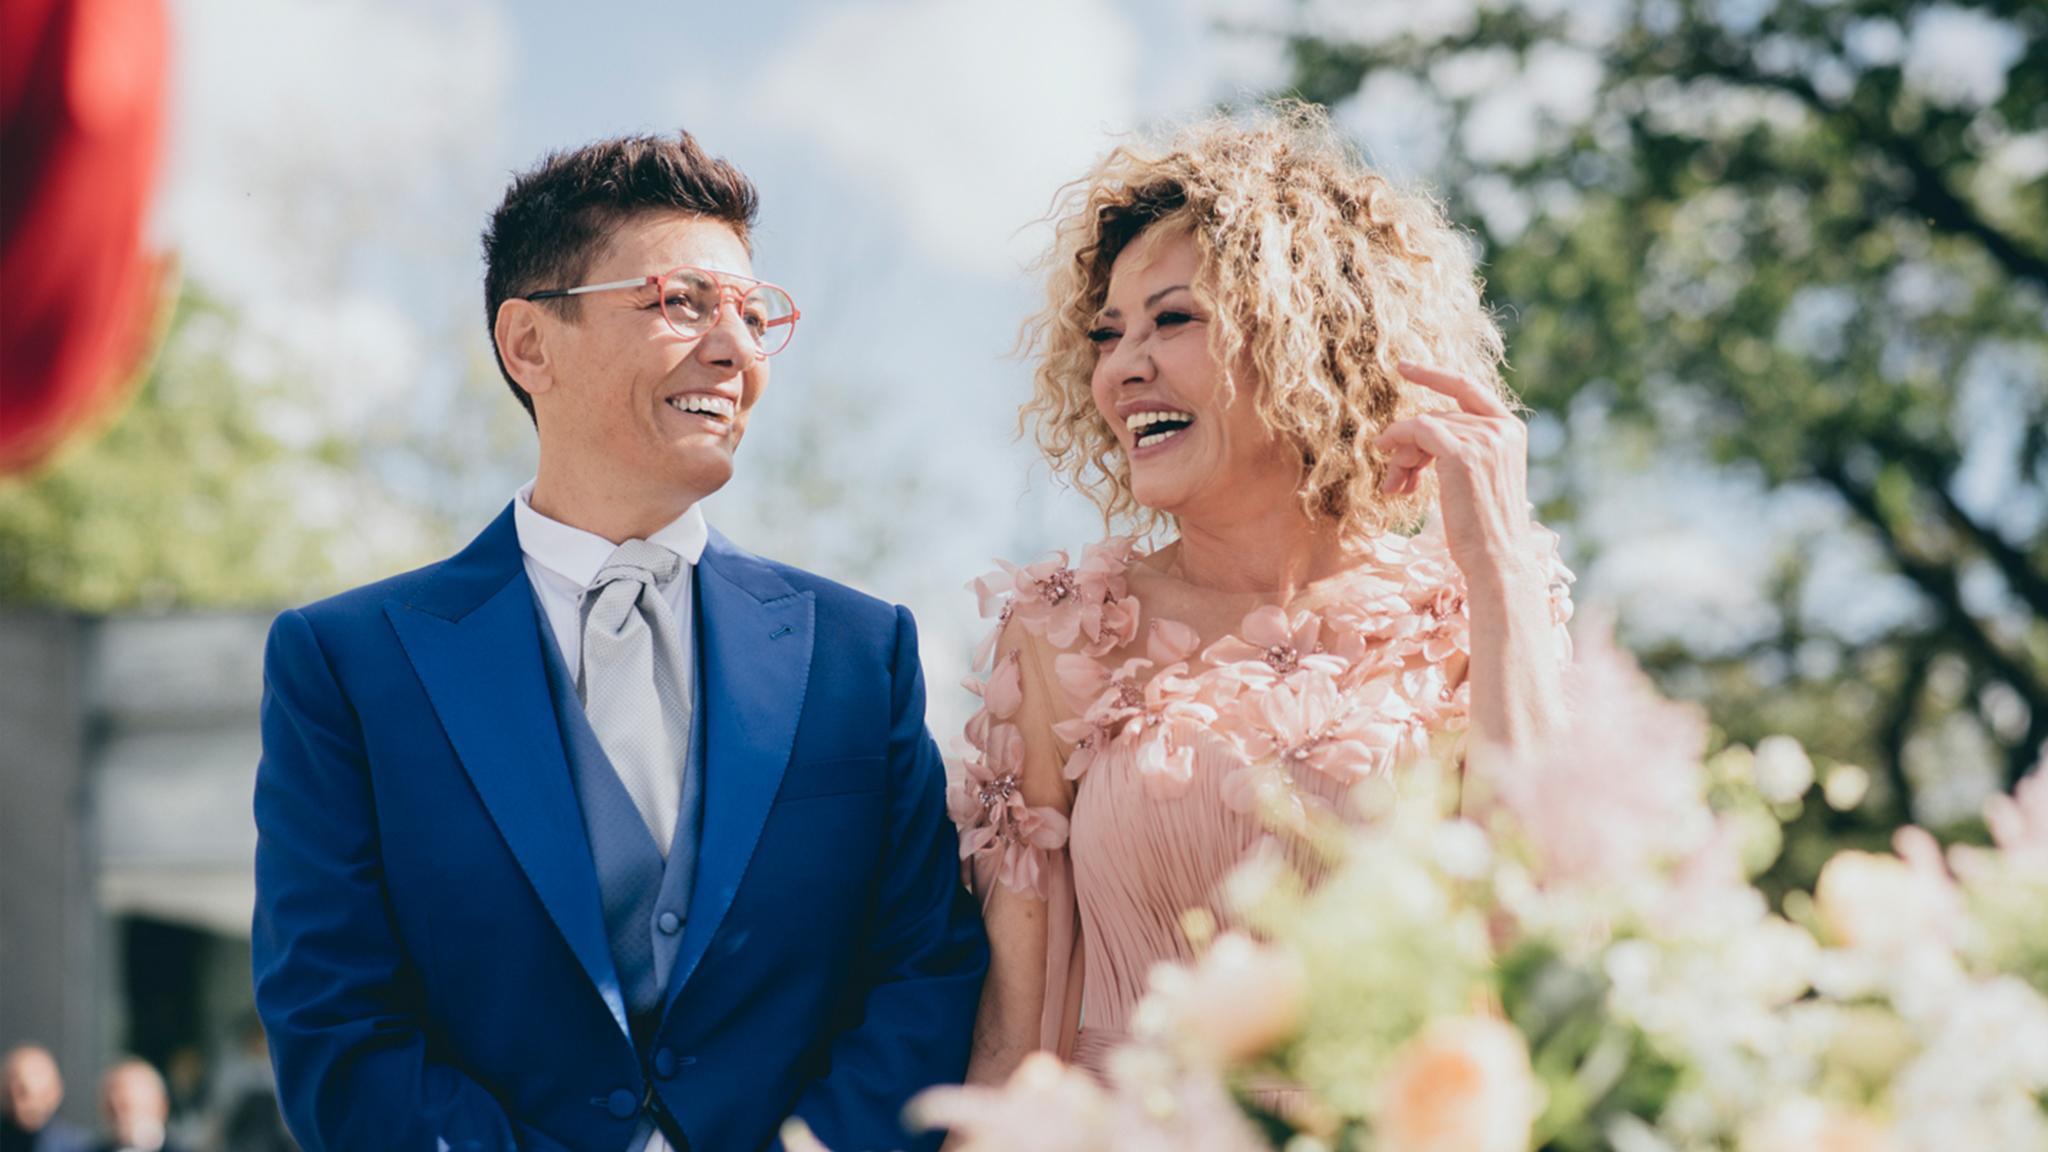 matrimonio non incontri EP 14 ita